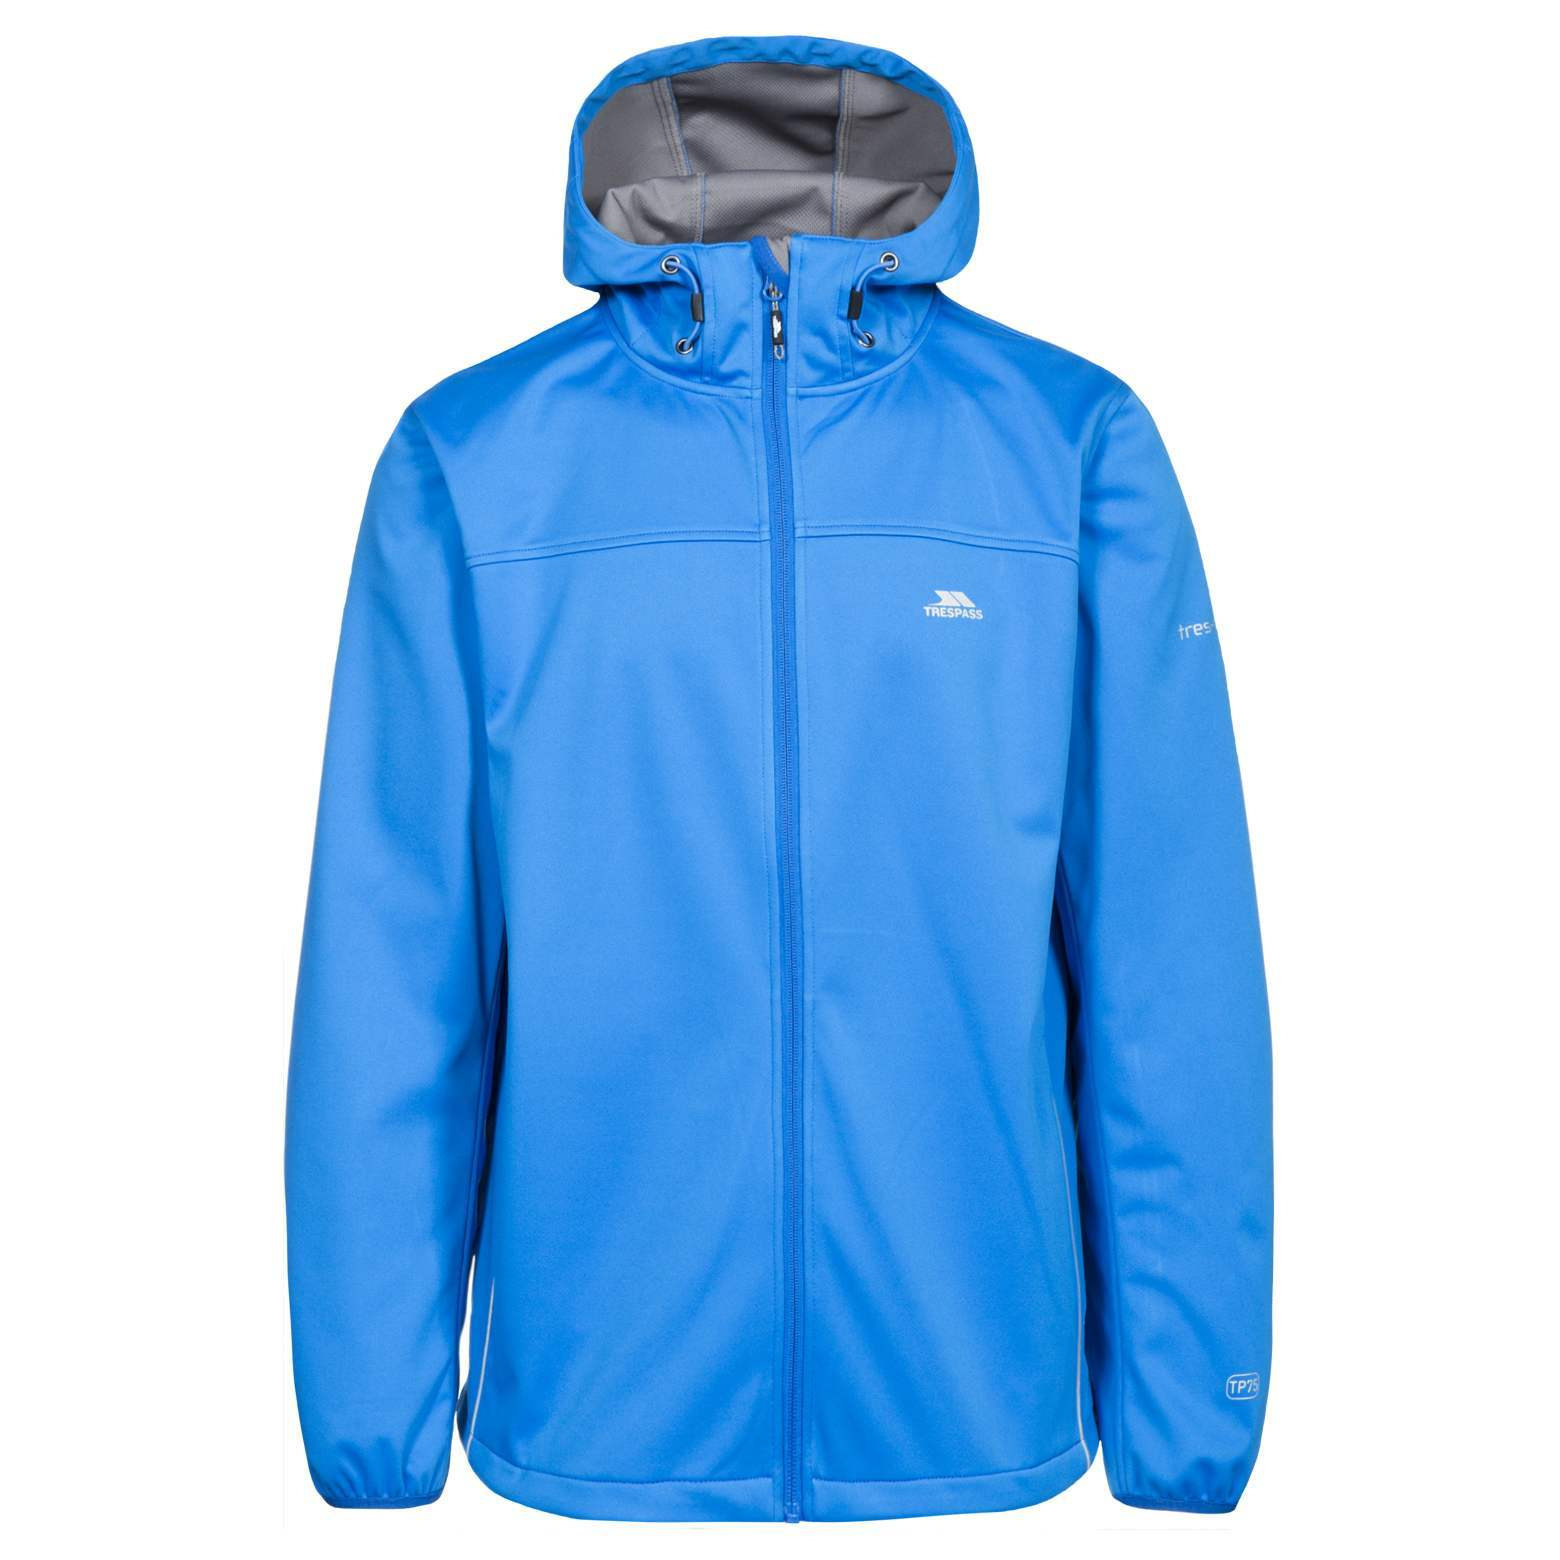 Trespass-Zeek-Para-Hombre-Impermeable-Transpirable-Abrigo-chaqueta-de-cascara-suave-con-capucha miniatura 14